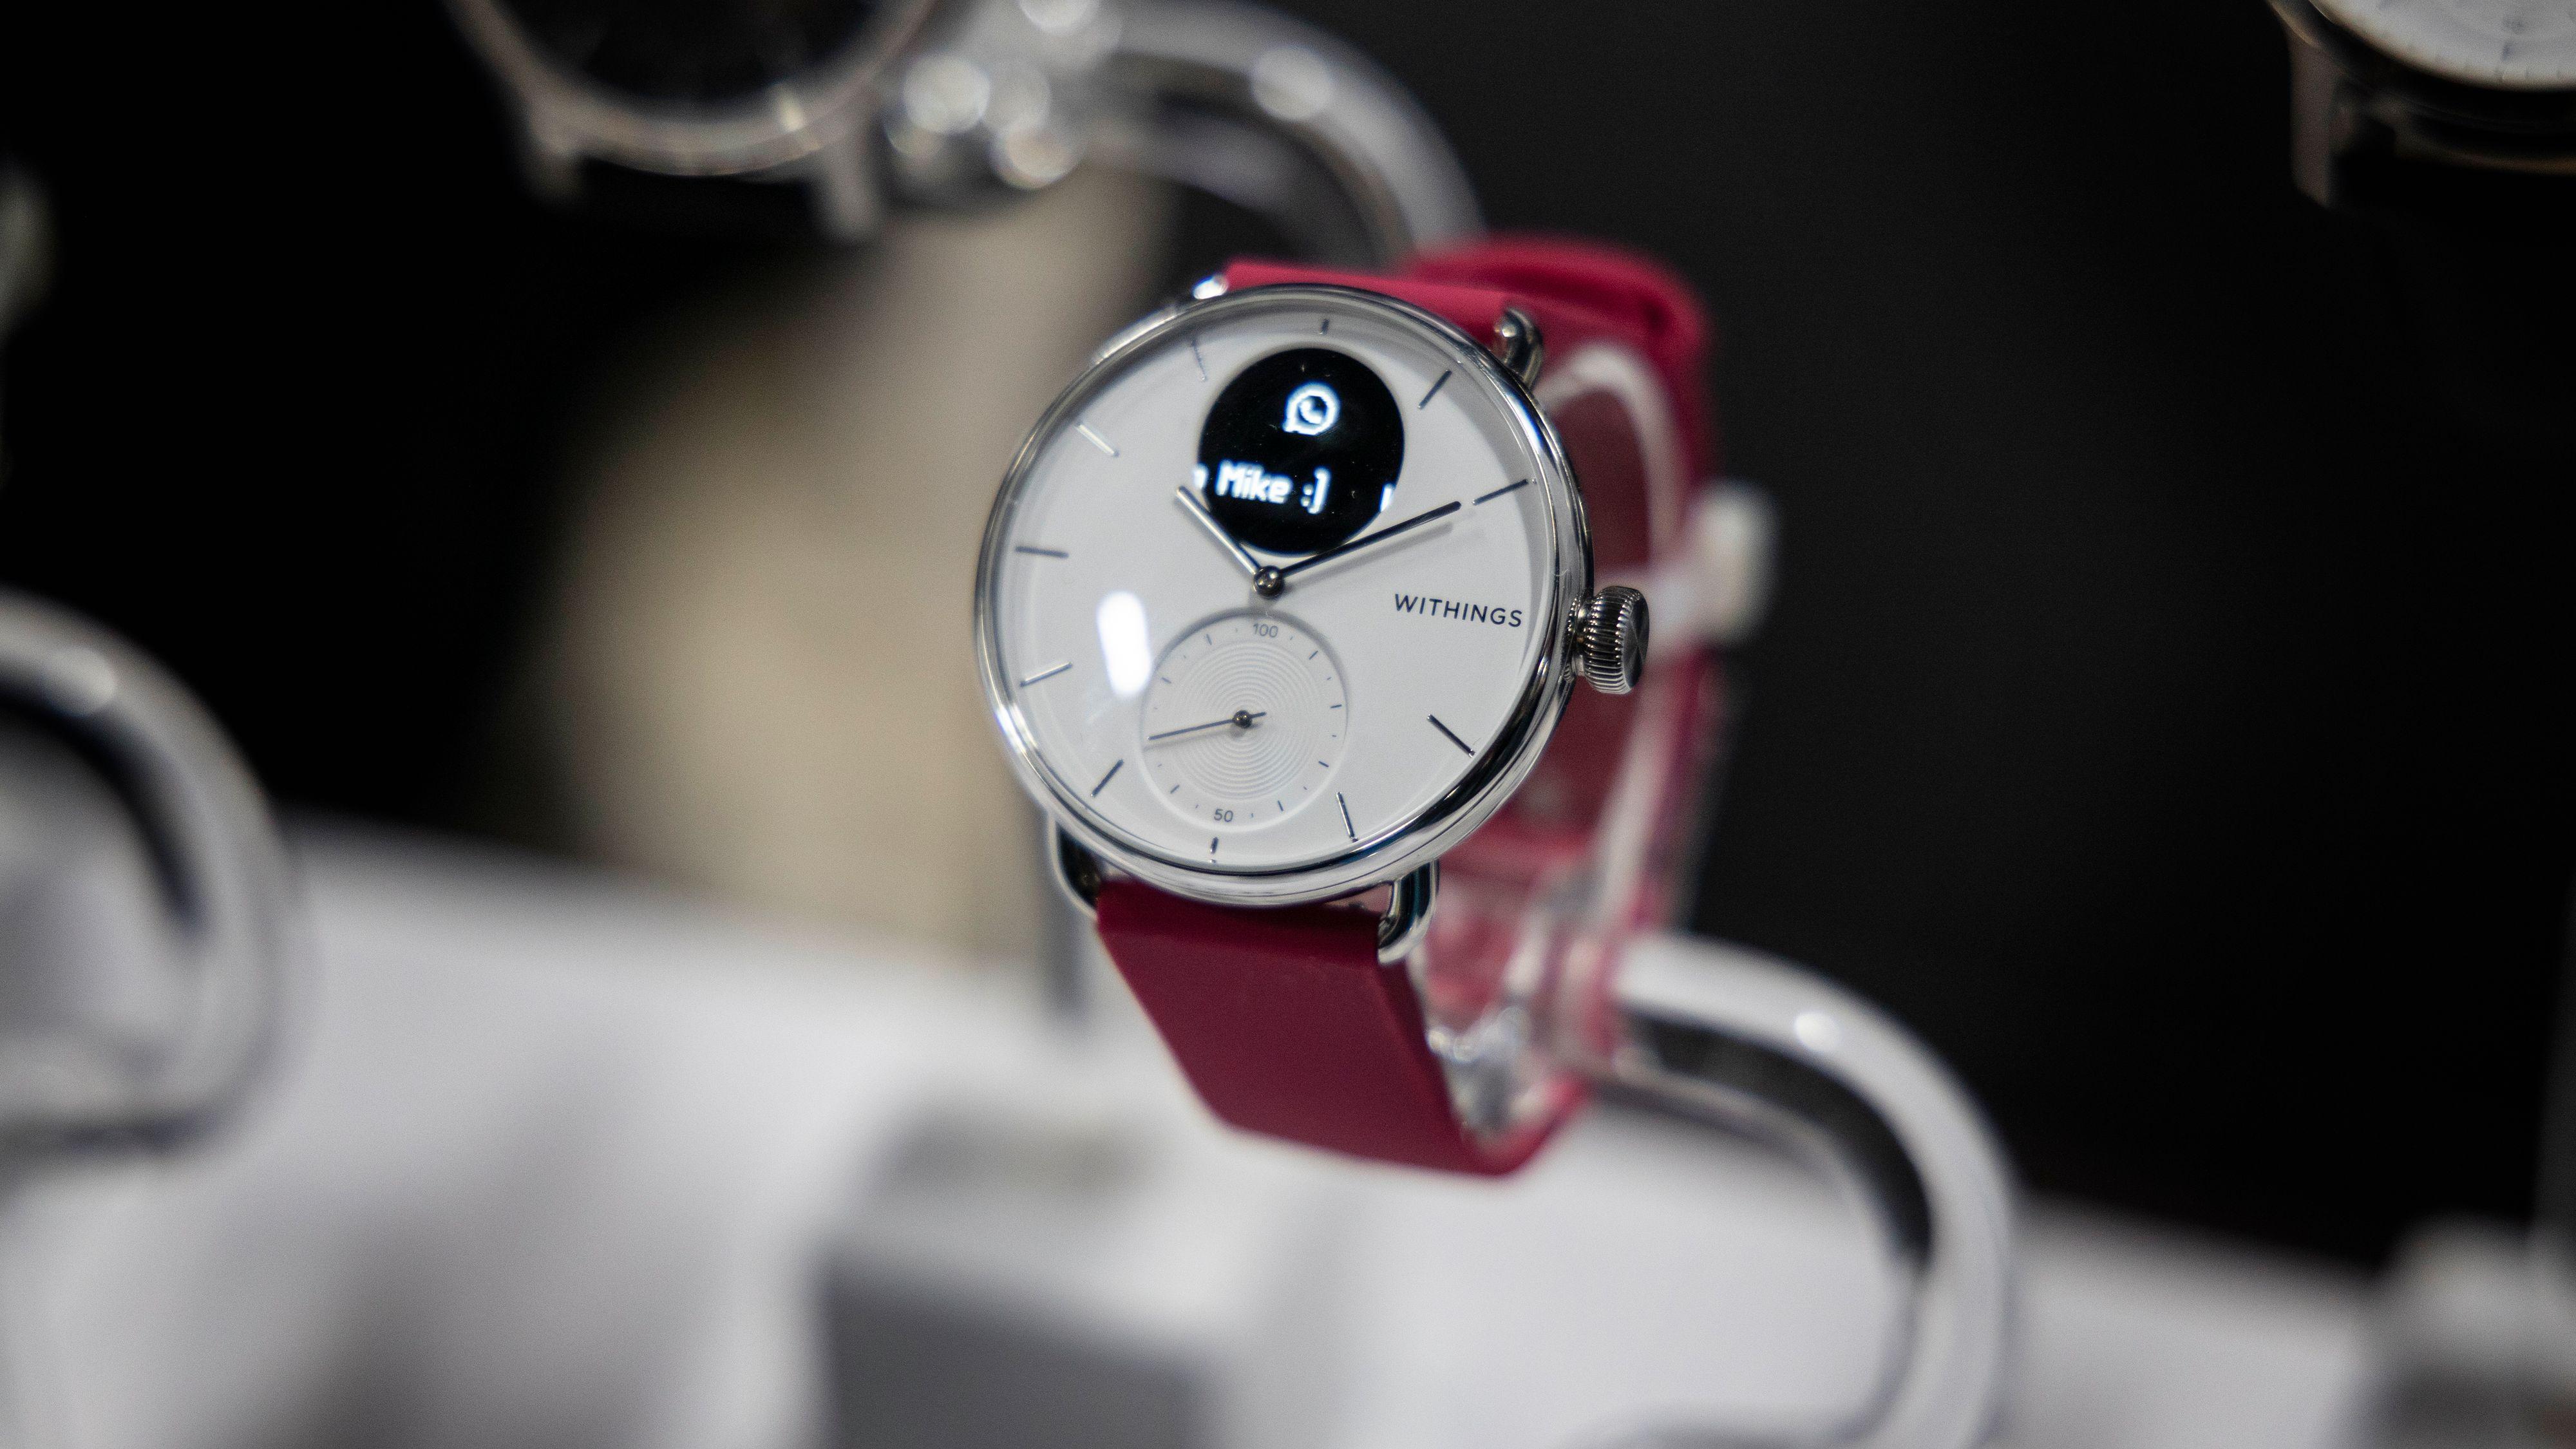 Withings' nye Scanwatch kombinerer pulsmåling med måling av oksygenmetning i blodet.